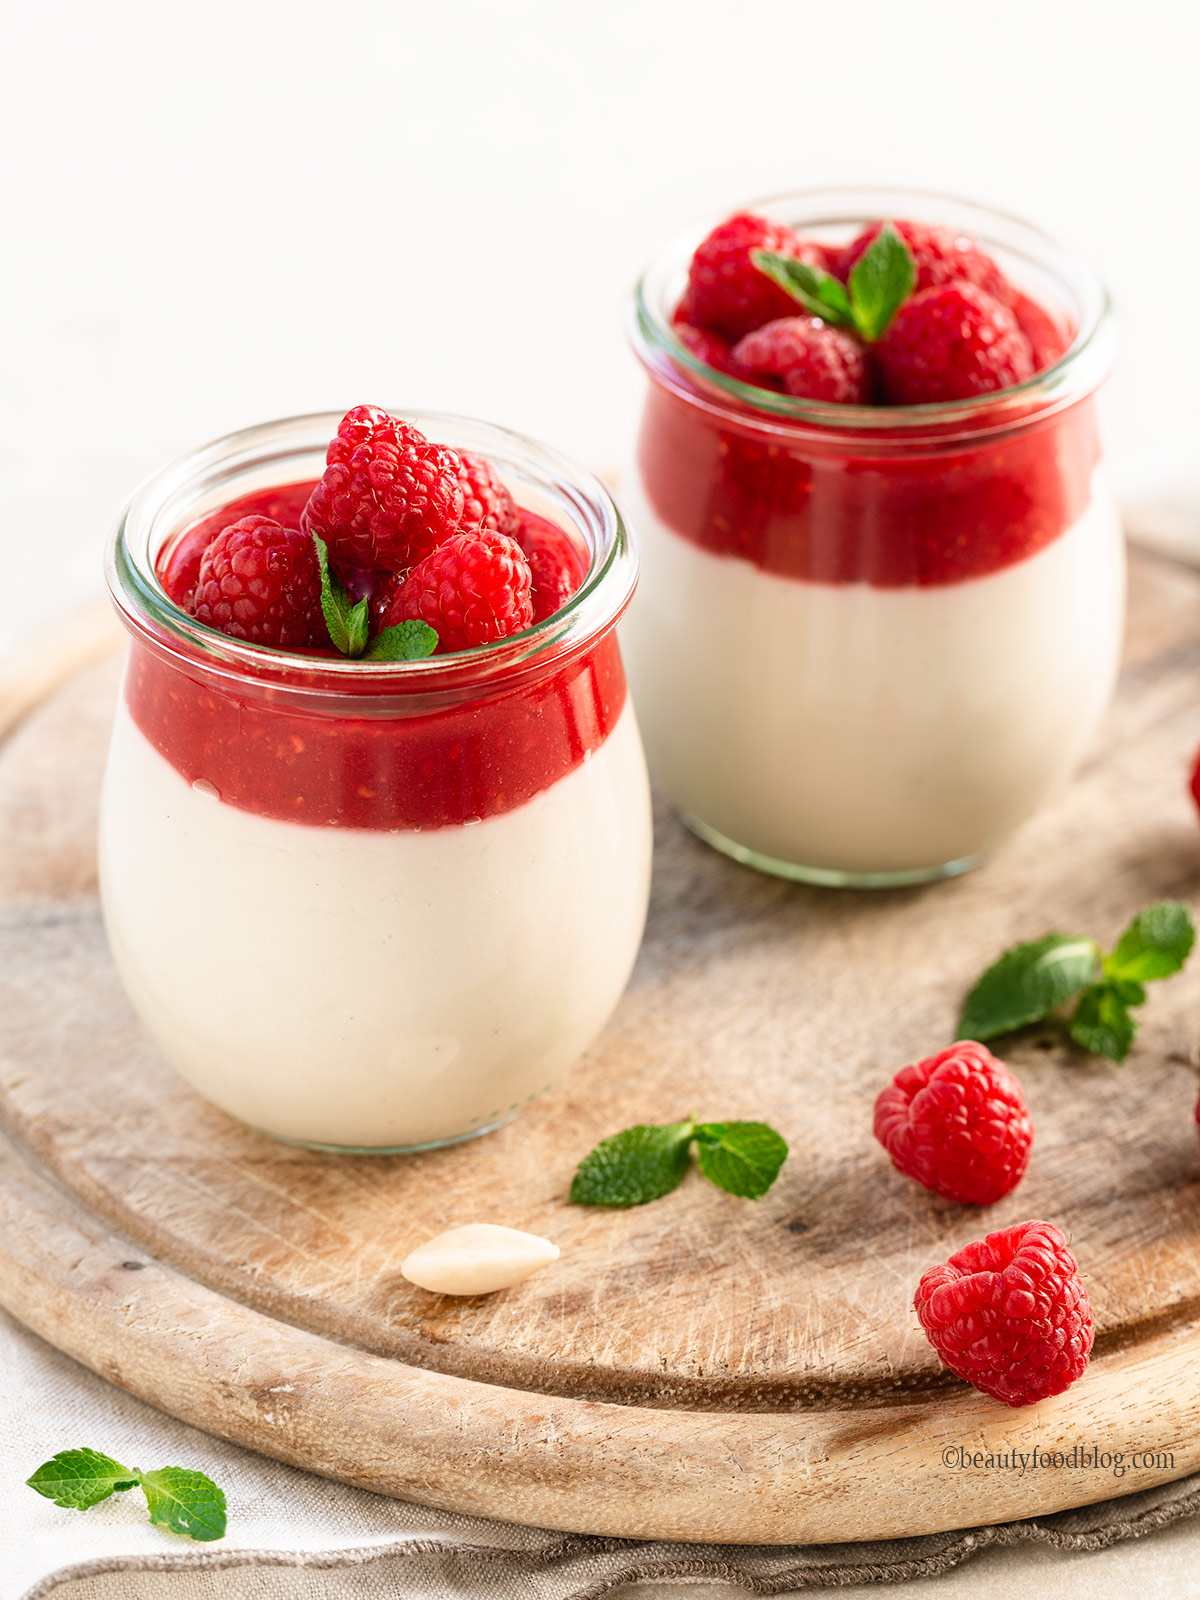 Vegan Raspberry Almond Panna Cotta Panna Cotta Vegan alle Mandorle e Lamponi